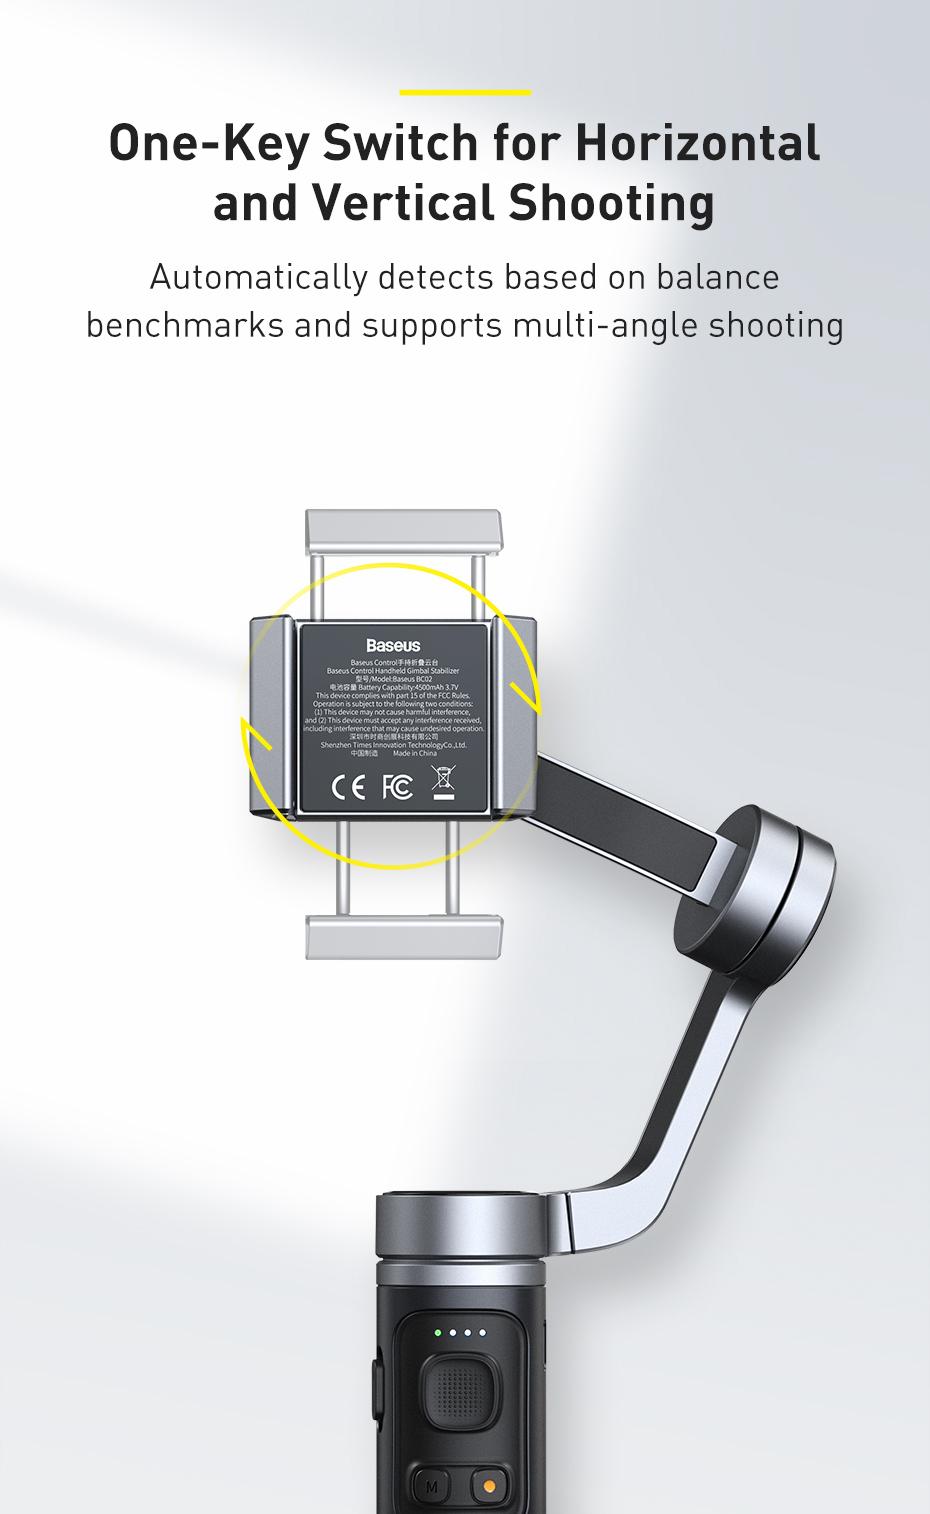 Baseus Control Smartphone Handheld Folding Gimbal Stabilizer 7